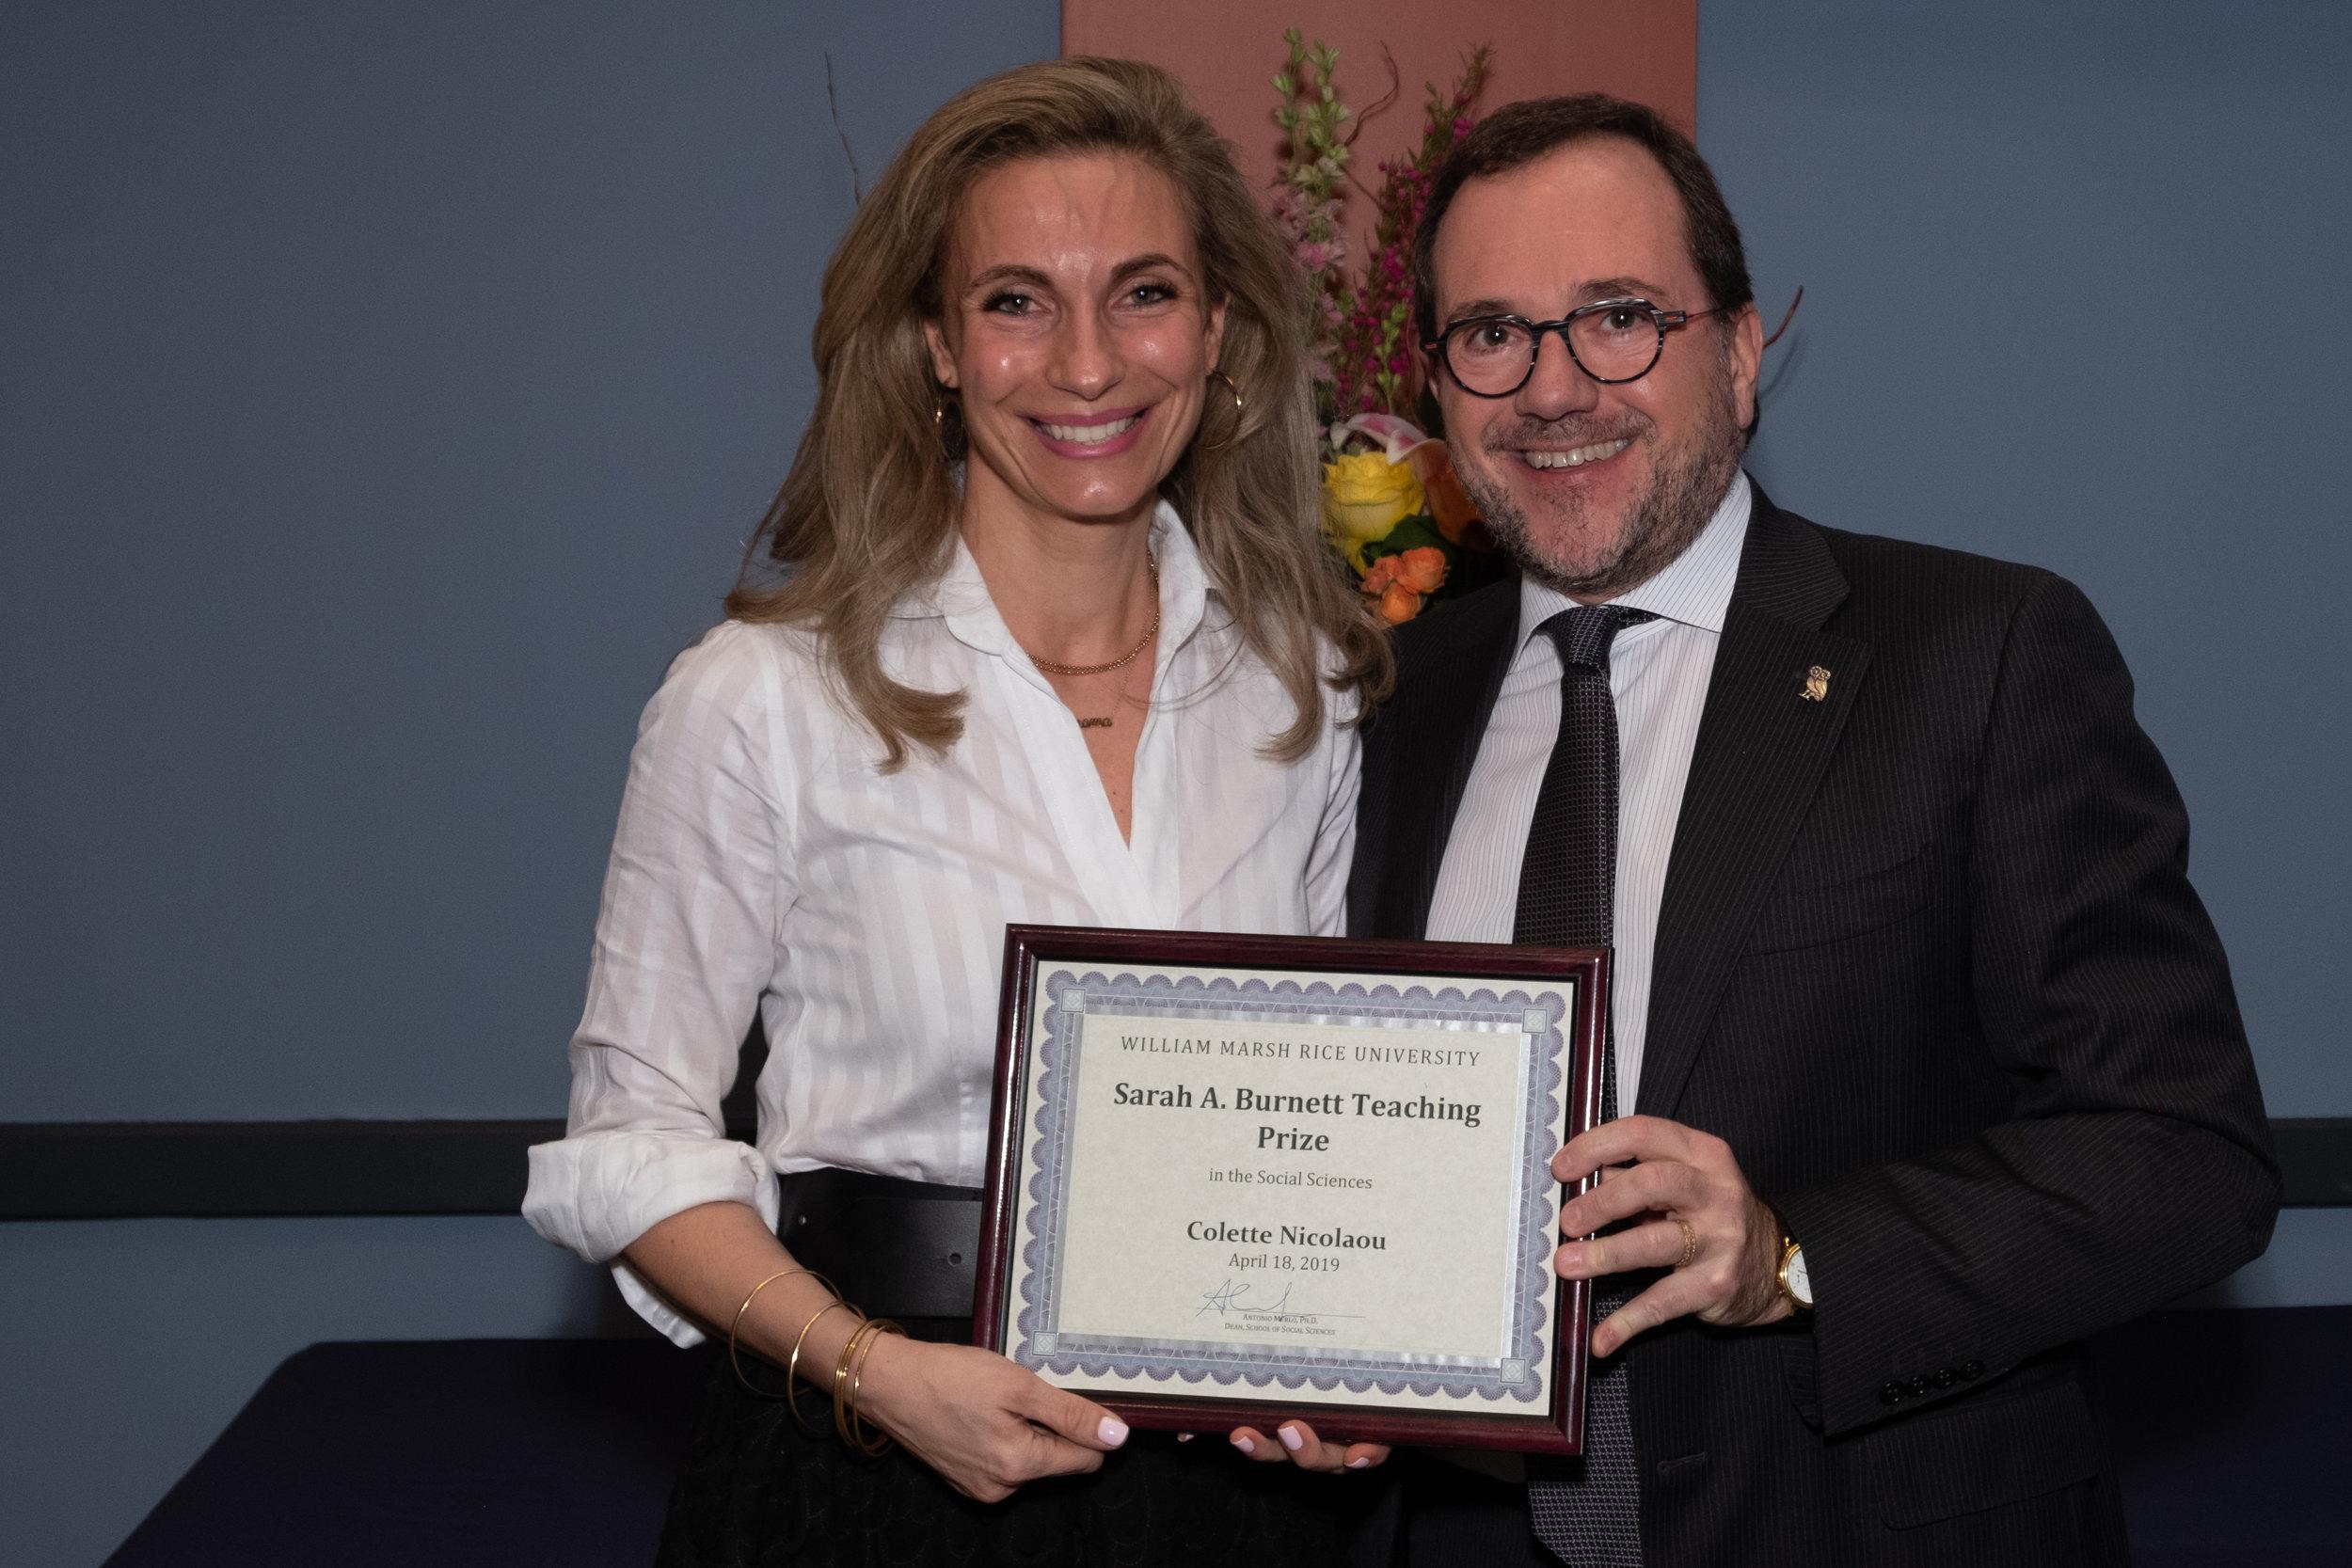 Antonio Merlo, Dean of the School of Social Sciences & Colette Nicolaou, Sarah A. Burnett Teaching Prize